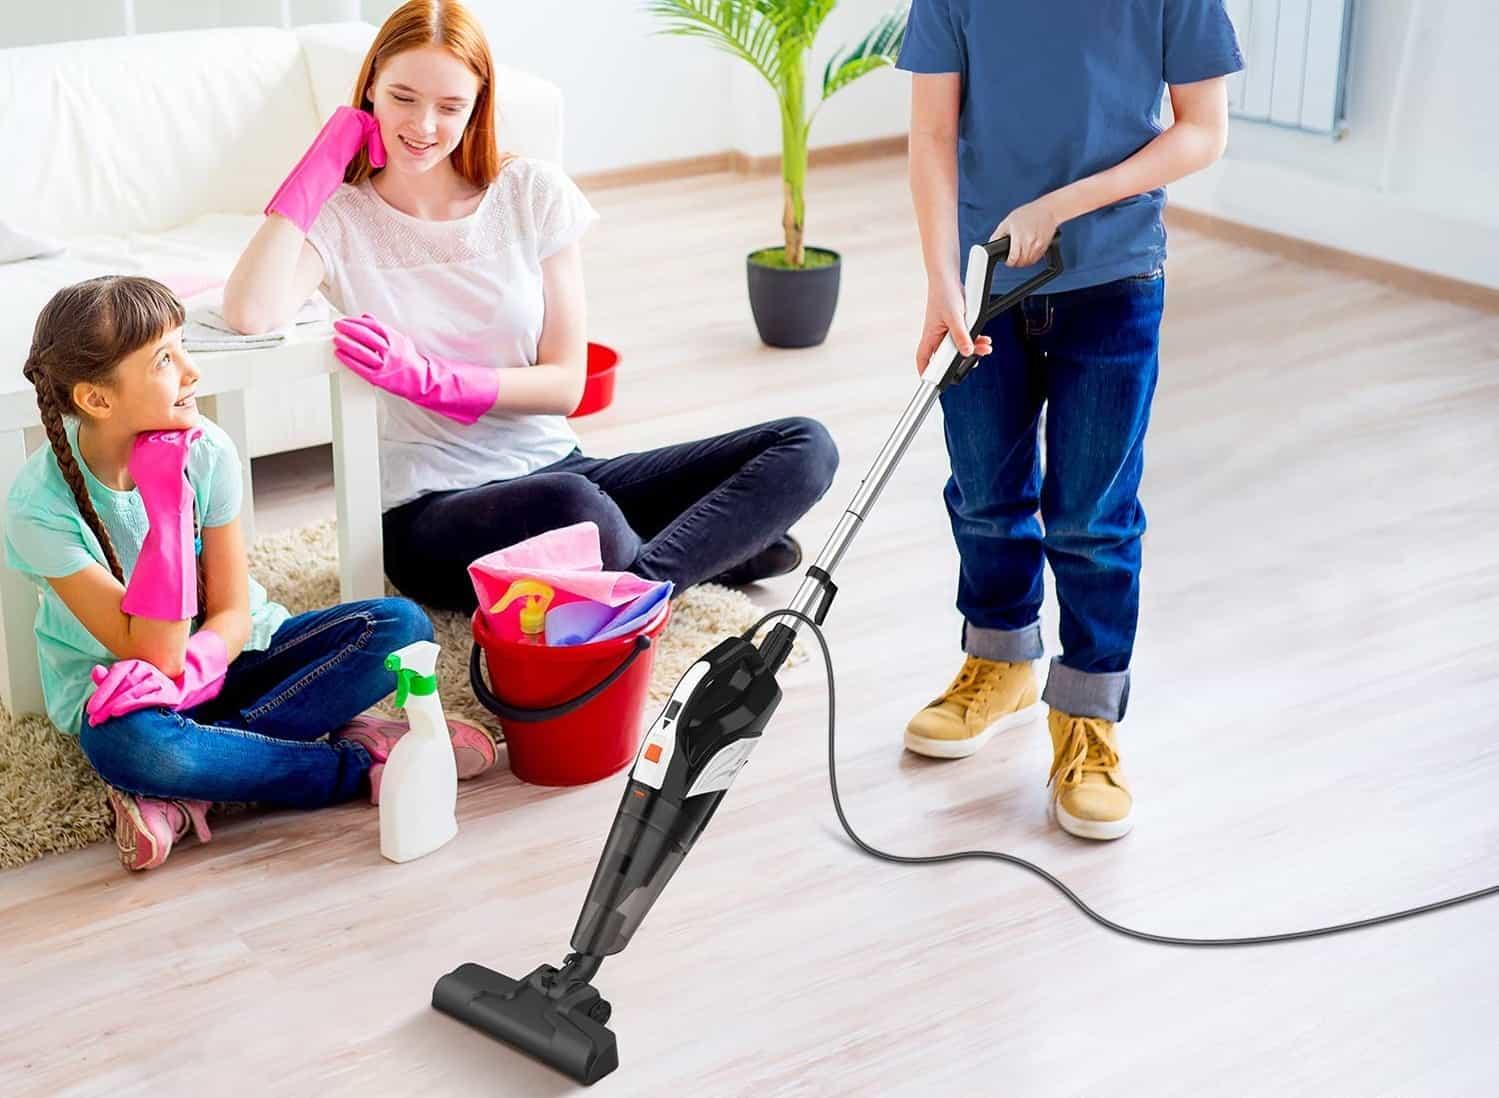 Stick Vacuum Cleaner vs Other Vacuum Cleaners